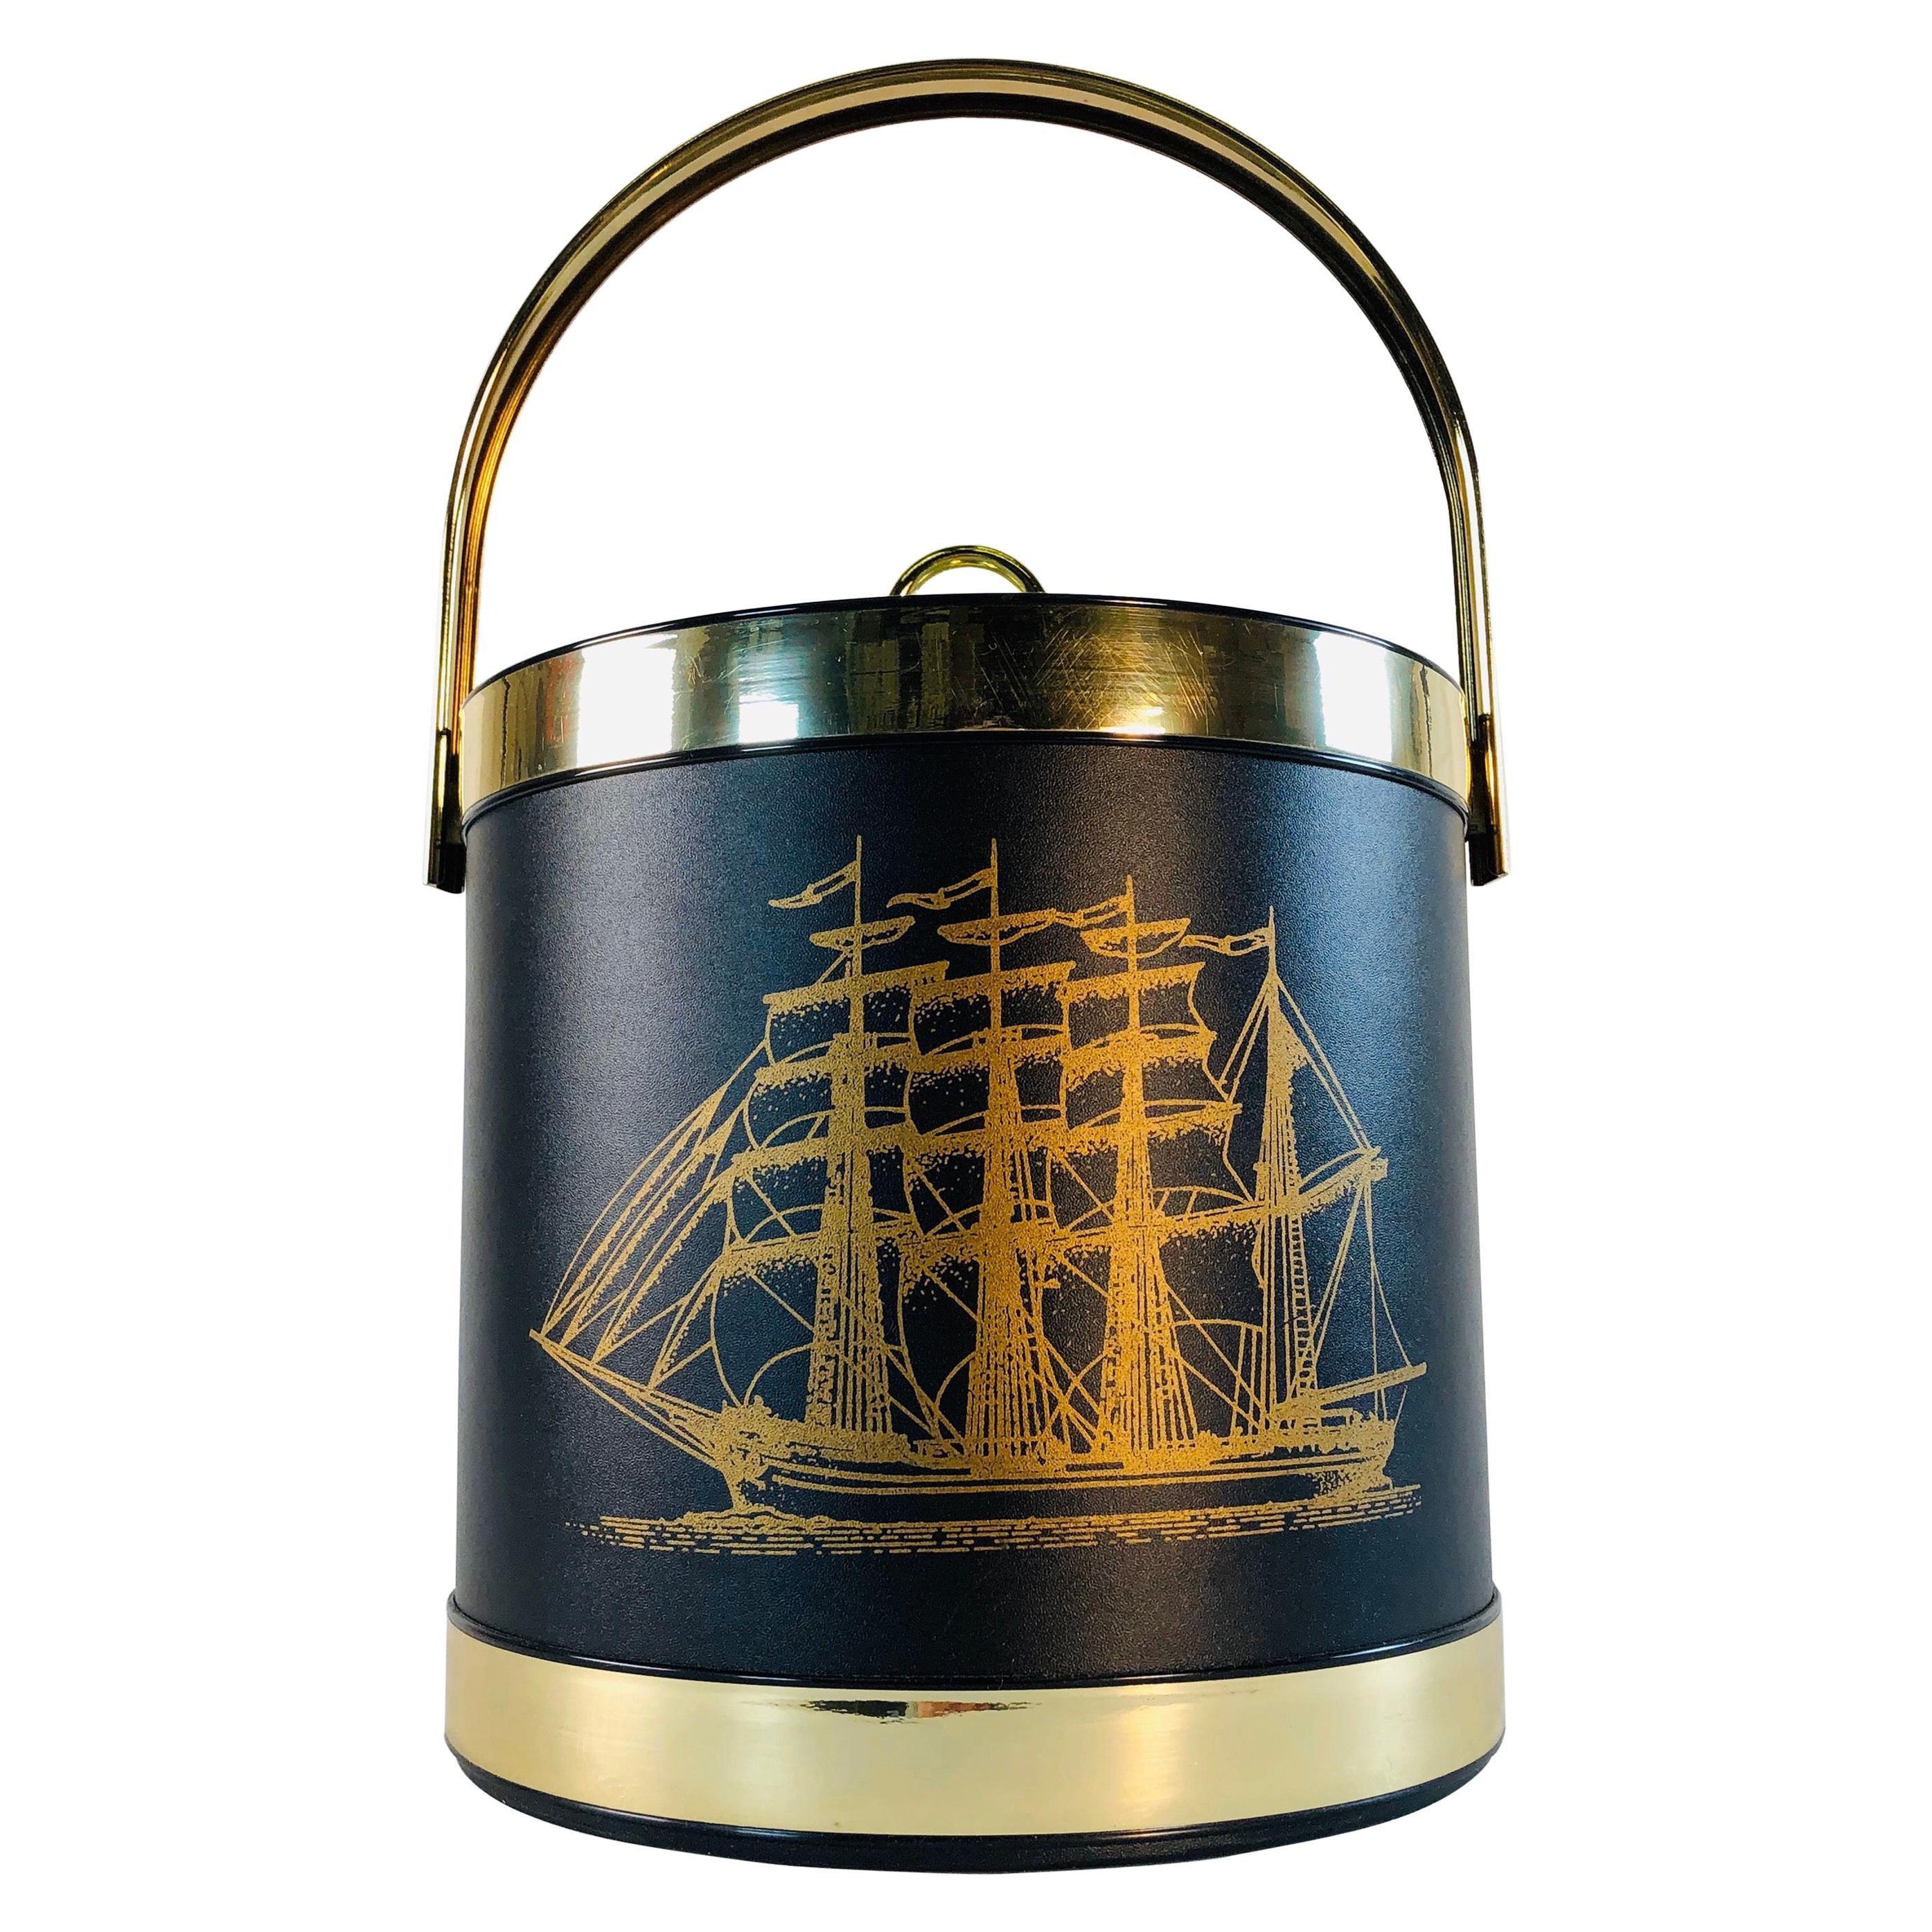 Vintage Black Ice Bucket with Ship Design